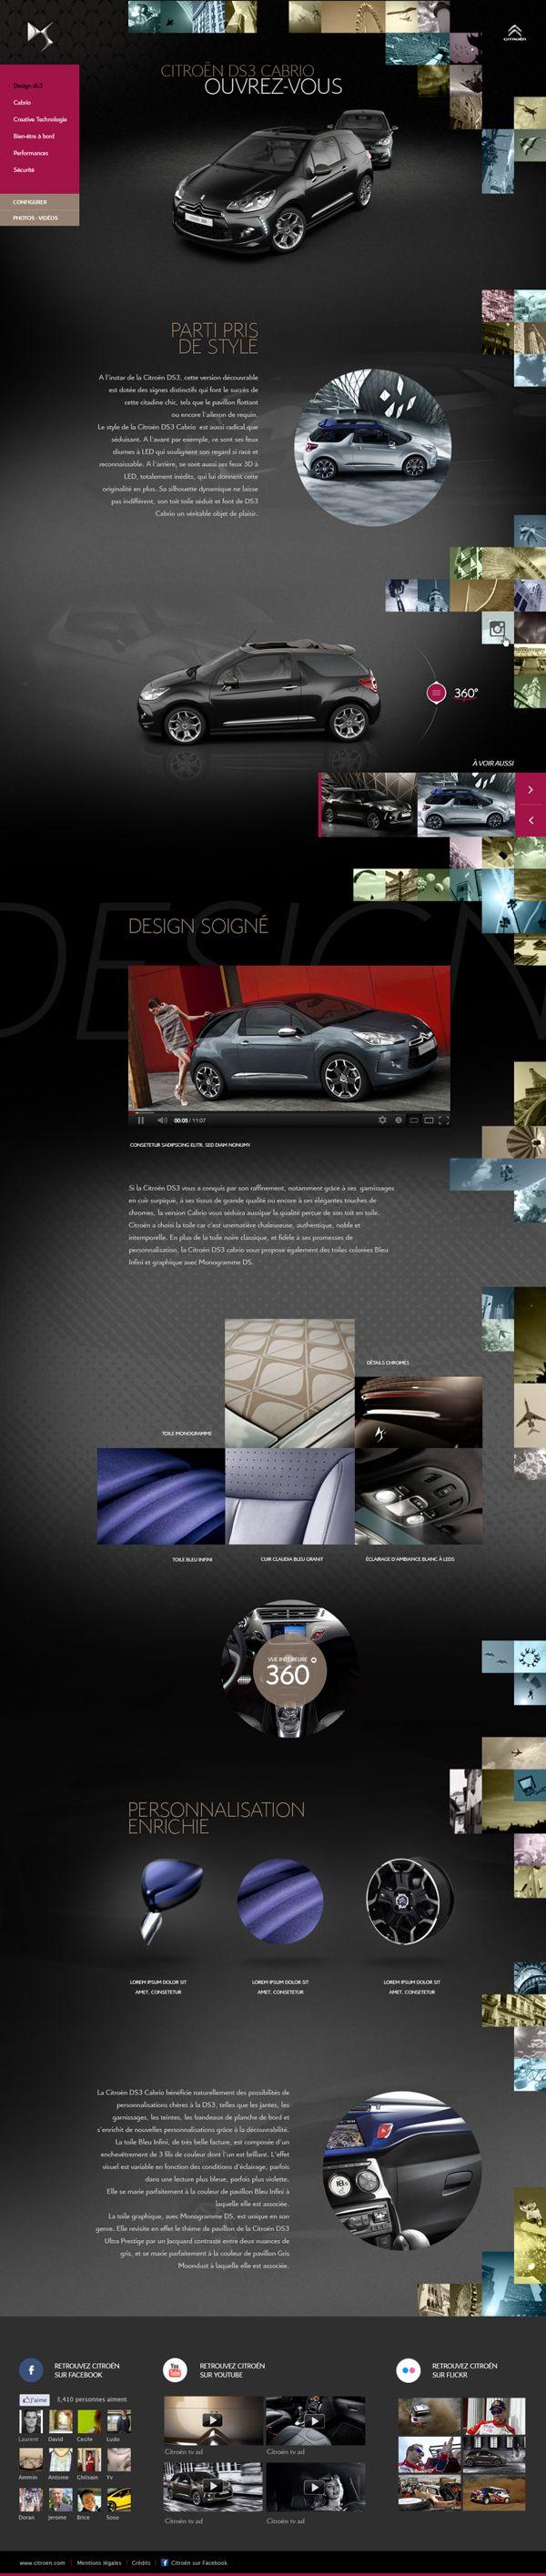 Cool Automotive Web Design on the Internet. Citroen. #automotive #webdesign @ http://www.pinterest.com/alfredchong/automotive-web-design/